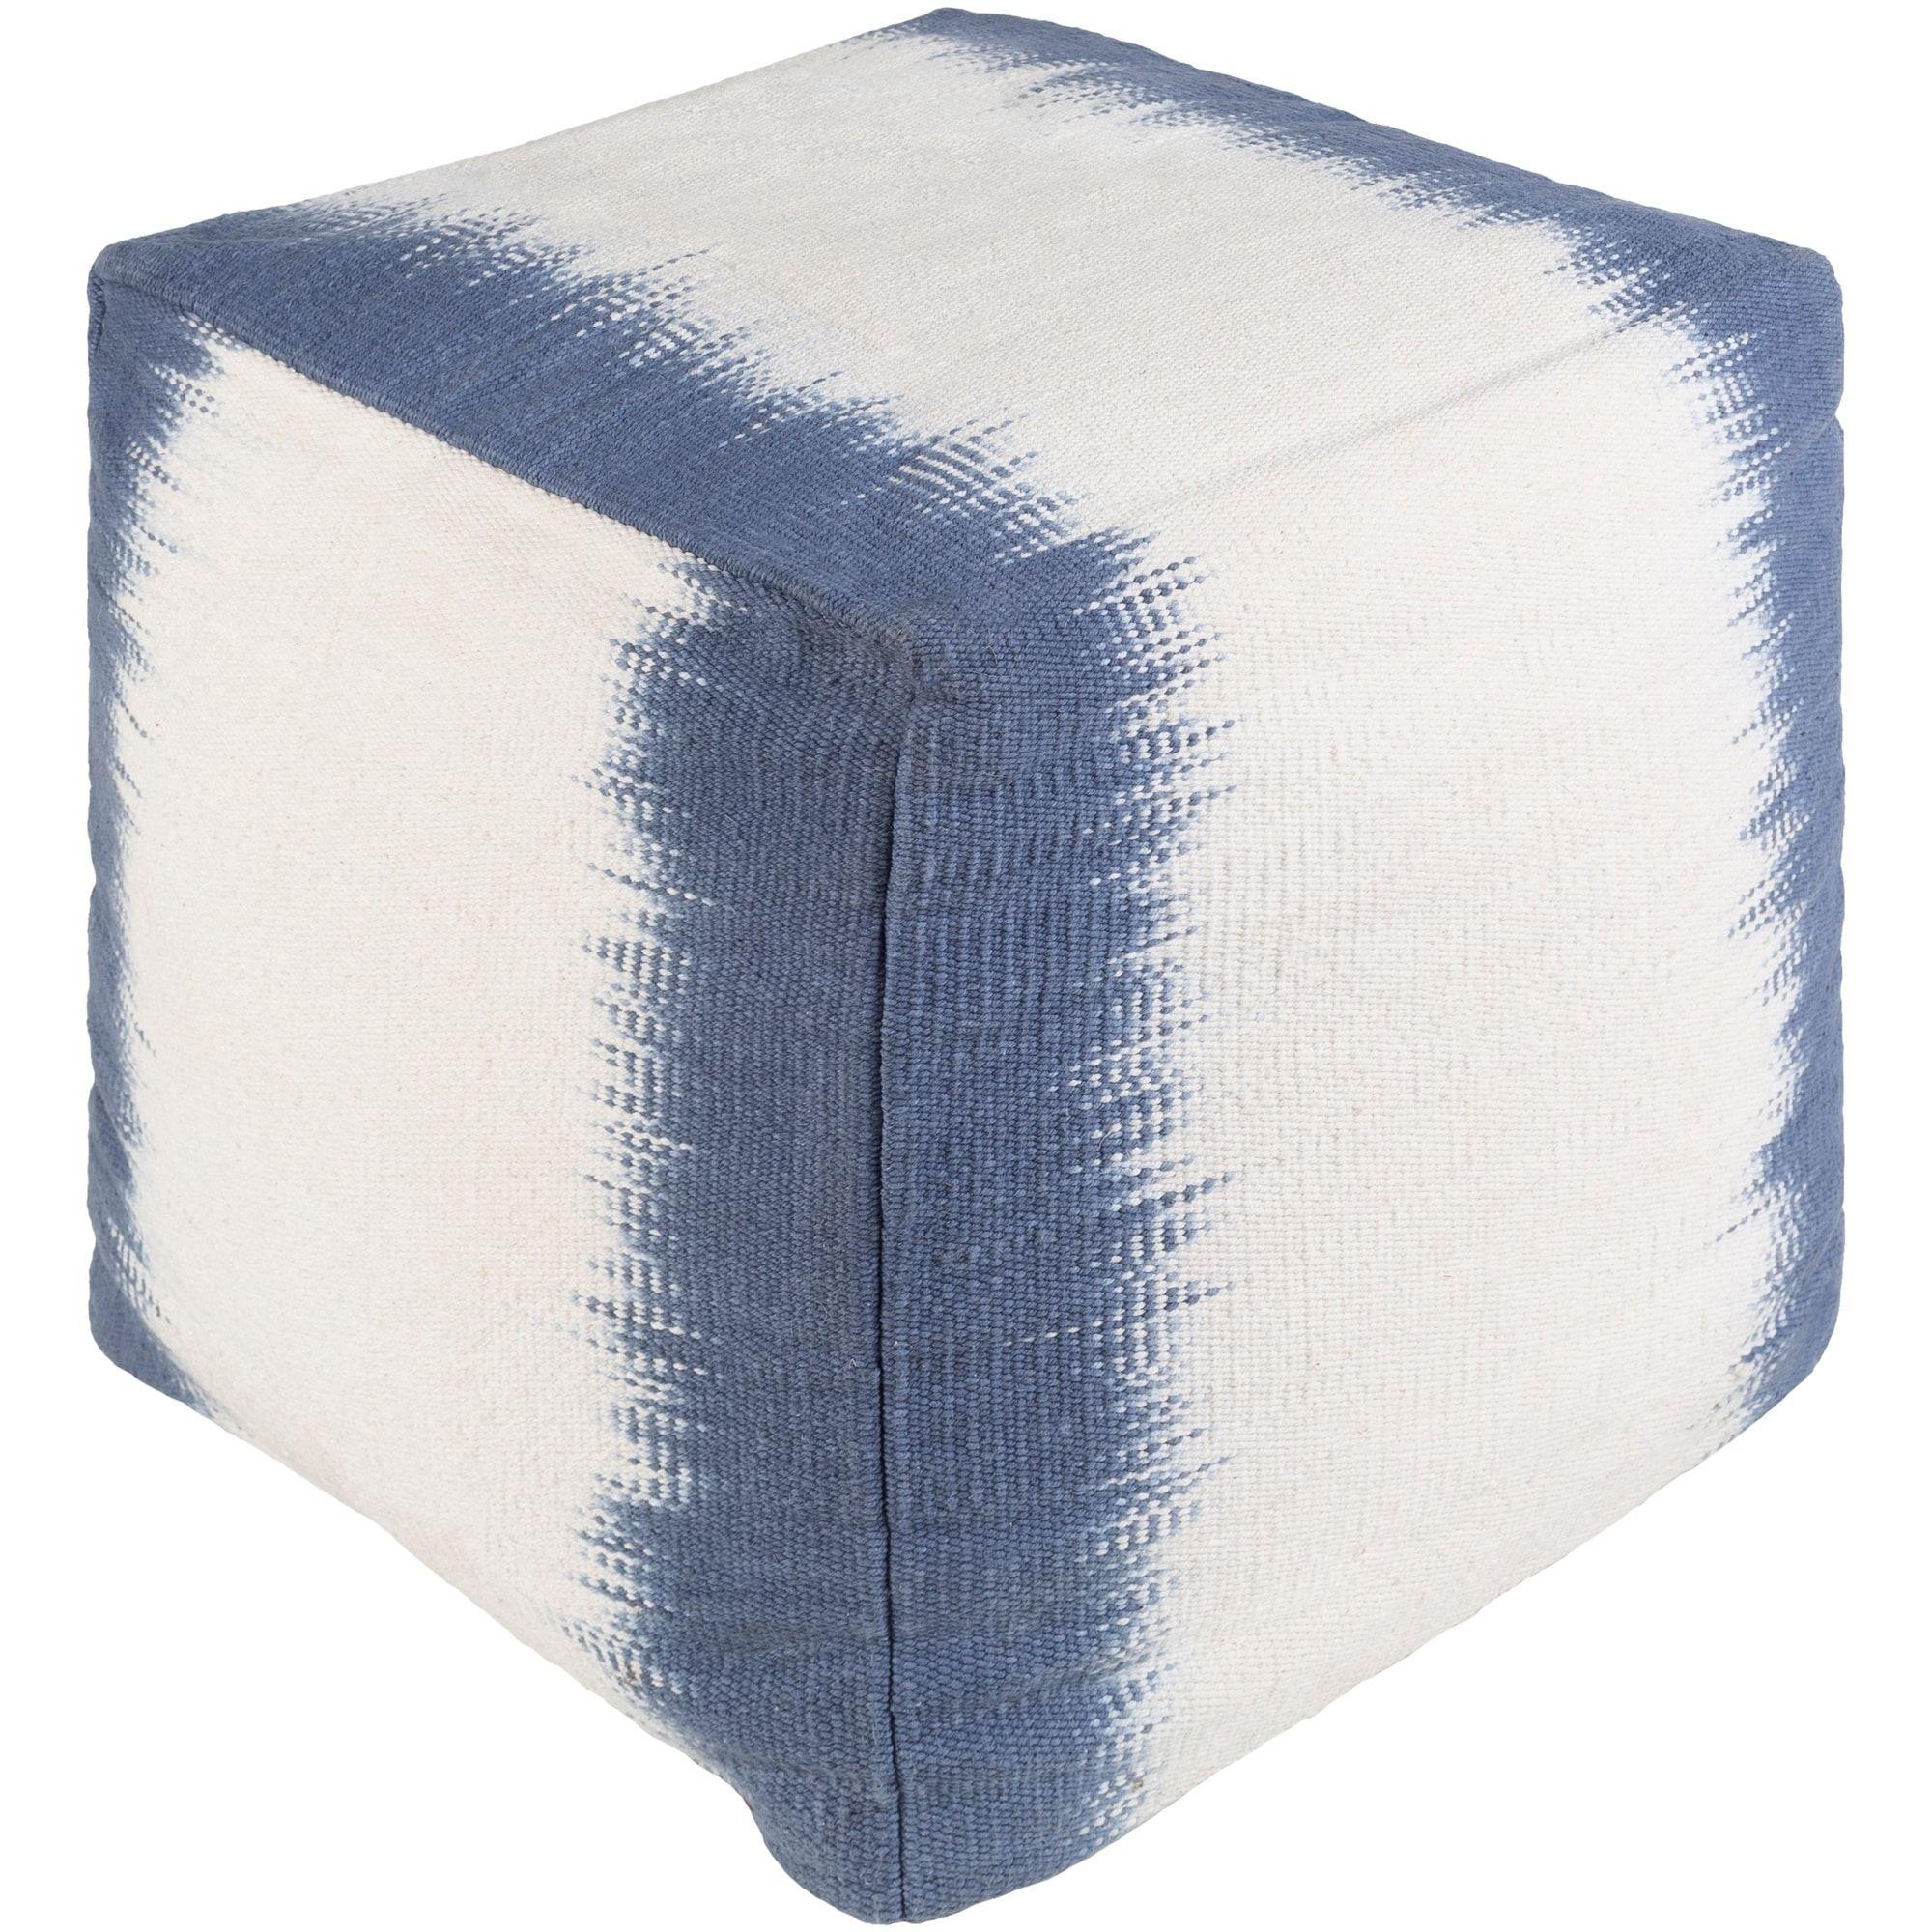 Admirable Acerra Modern Abstract Denim 18 Inch Pouf Blue Size 16 X Creativecarmelina Interior Chair Design Creativecarmelinacom